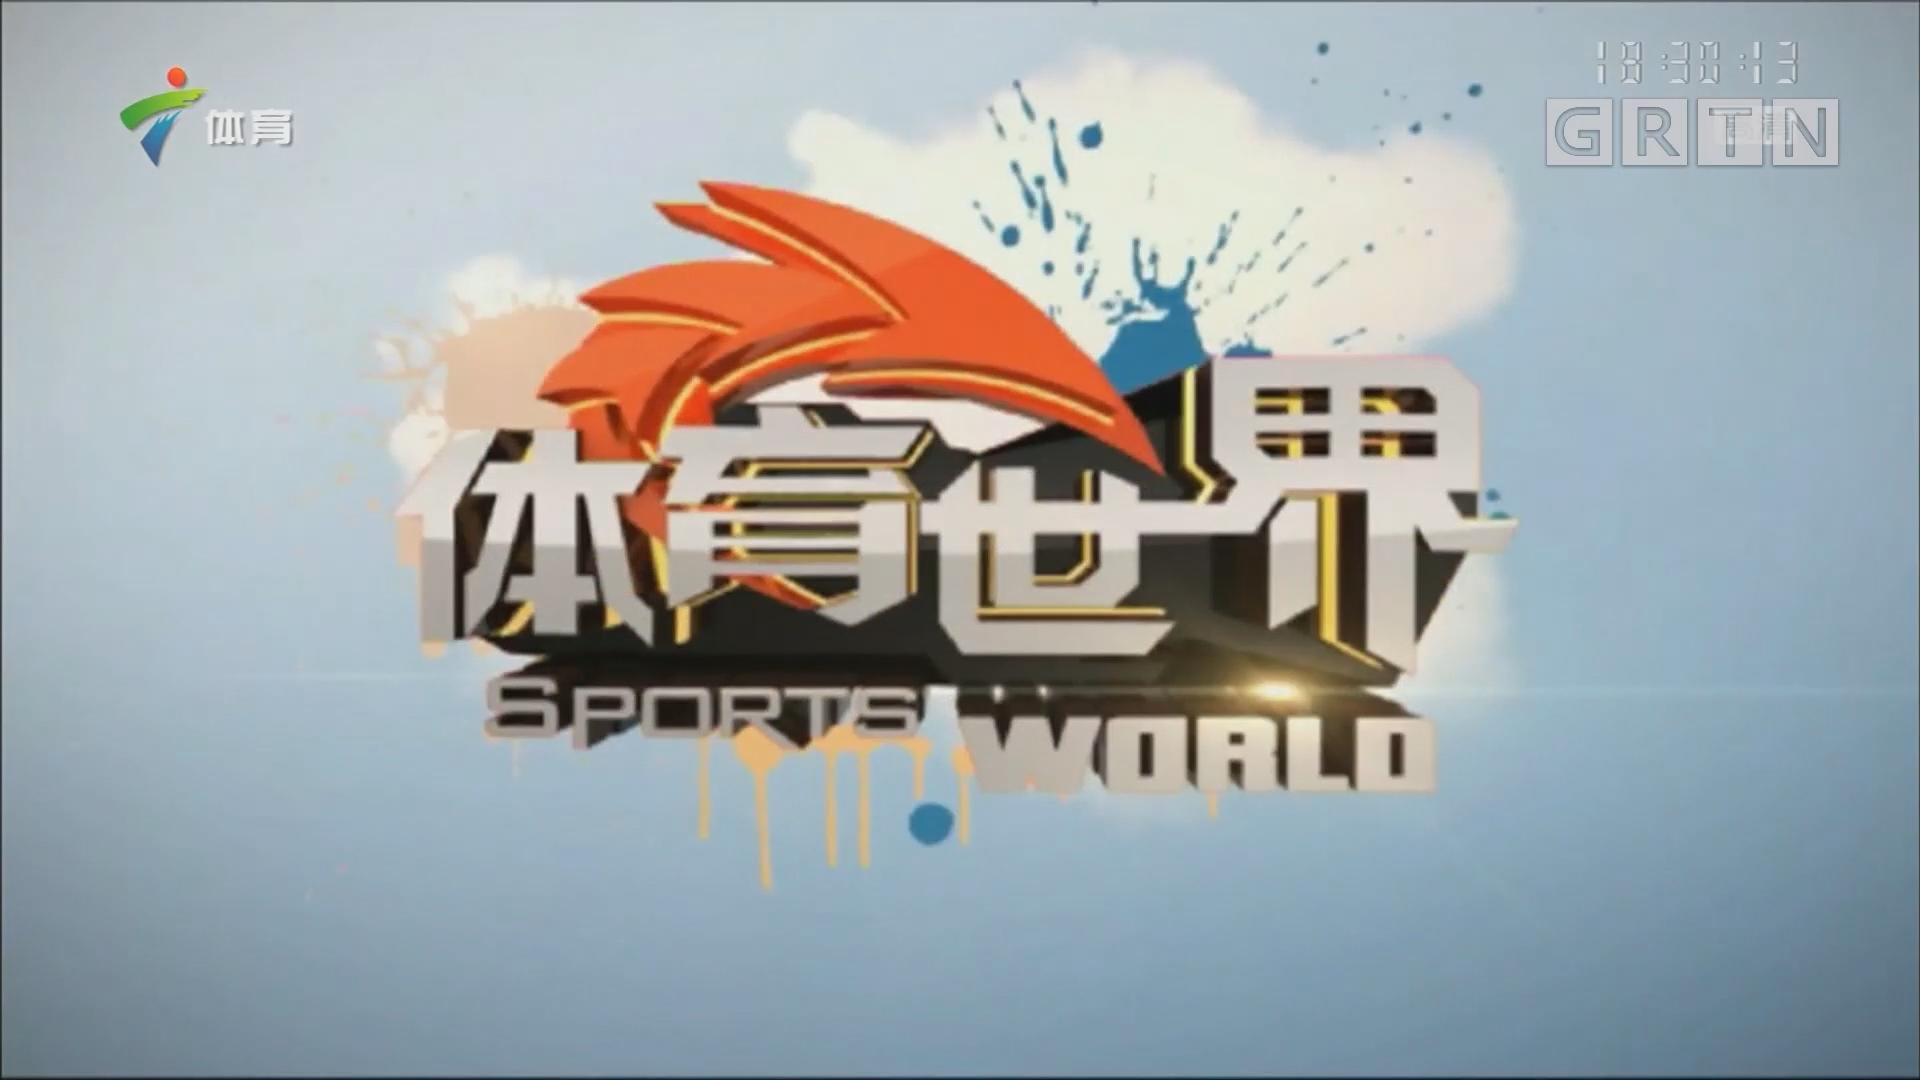 [HD][2018-01-22]体育世界:展现草根篮球魅力 路人王篮球联赛第三季收官